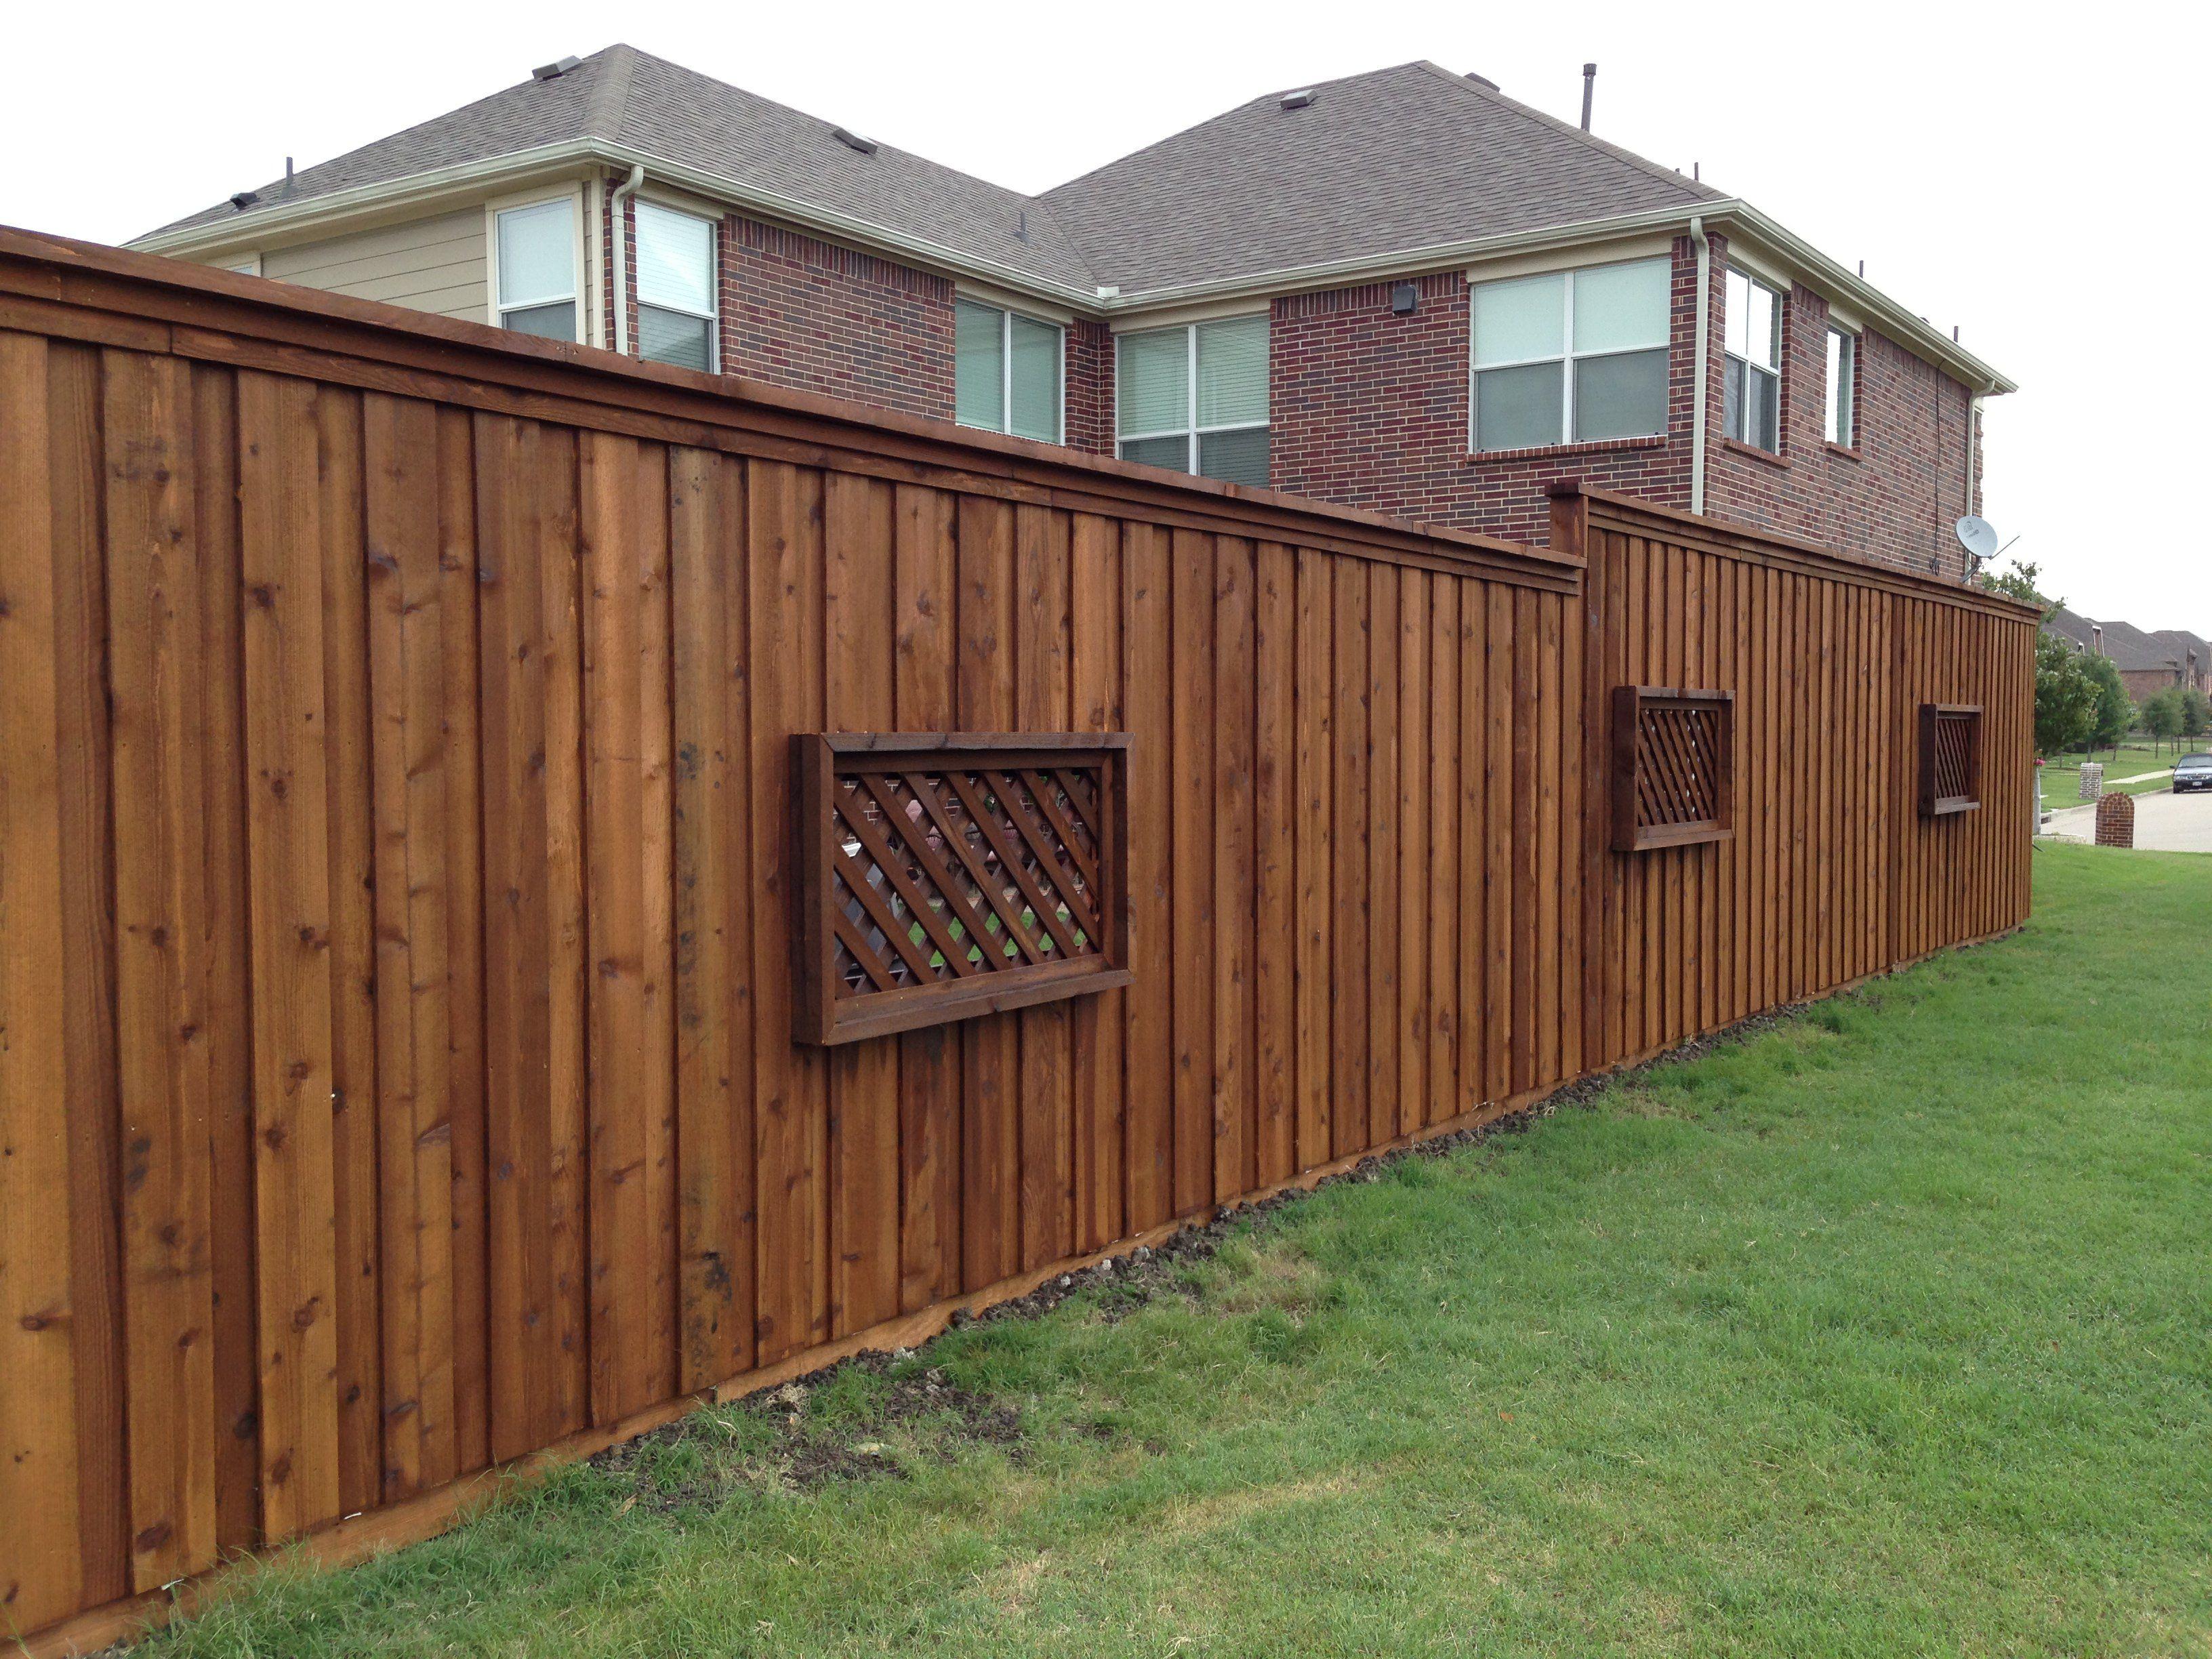 Lattice Fence, Fence Ideas, Backyard Ideas, Fences, Privacy Walls, Outdoor